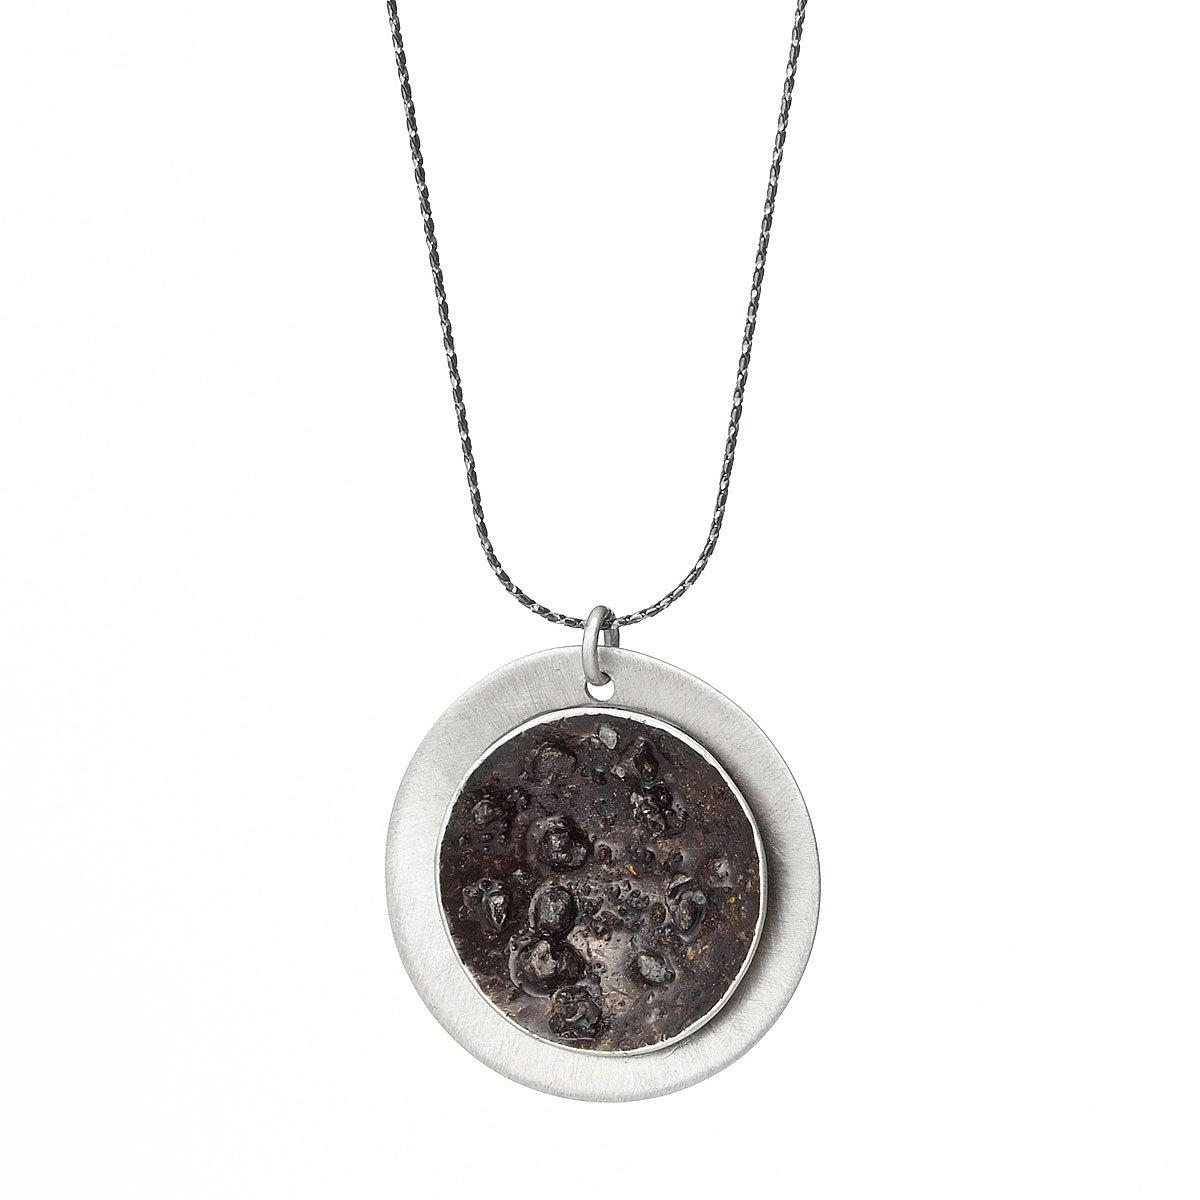 Meteor Showers Meteorite Necklace